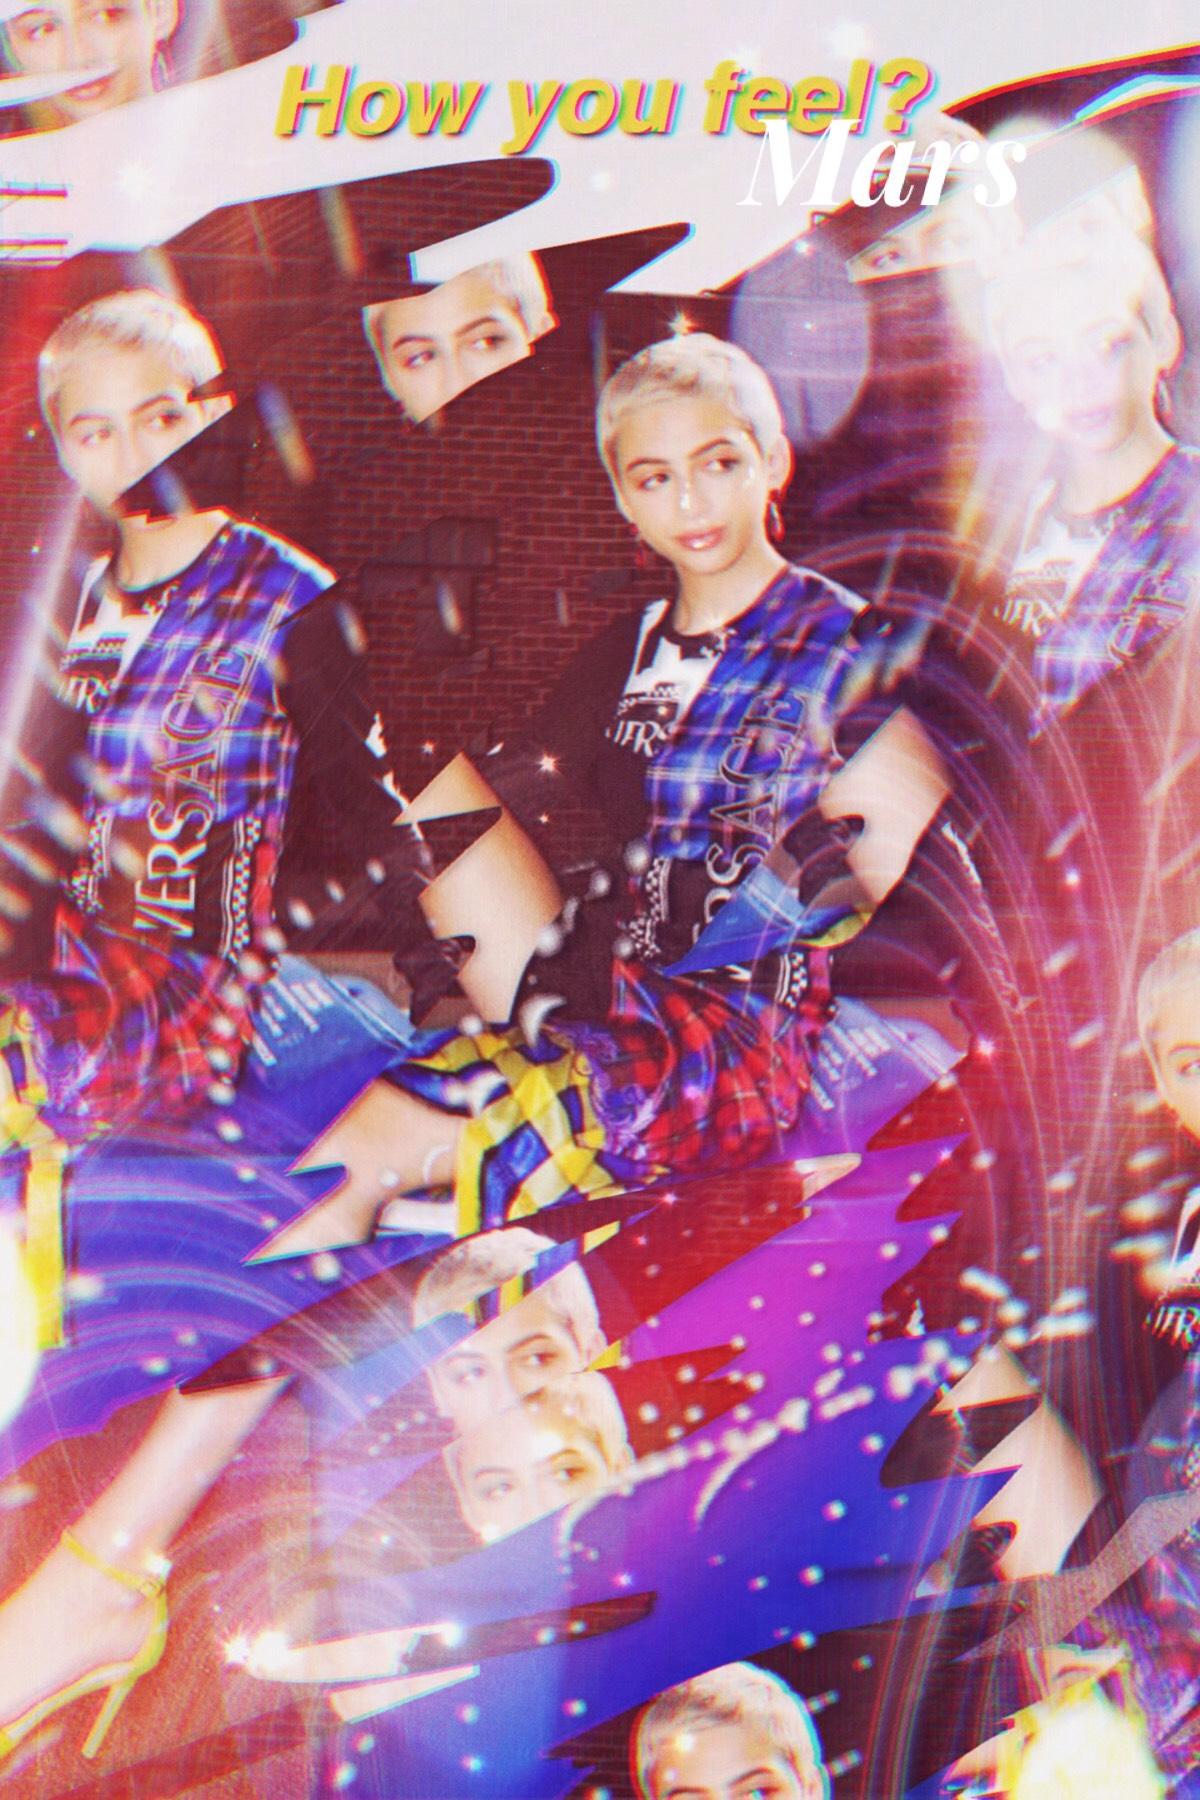 Collage by GoodMorningMars